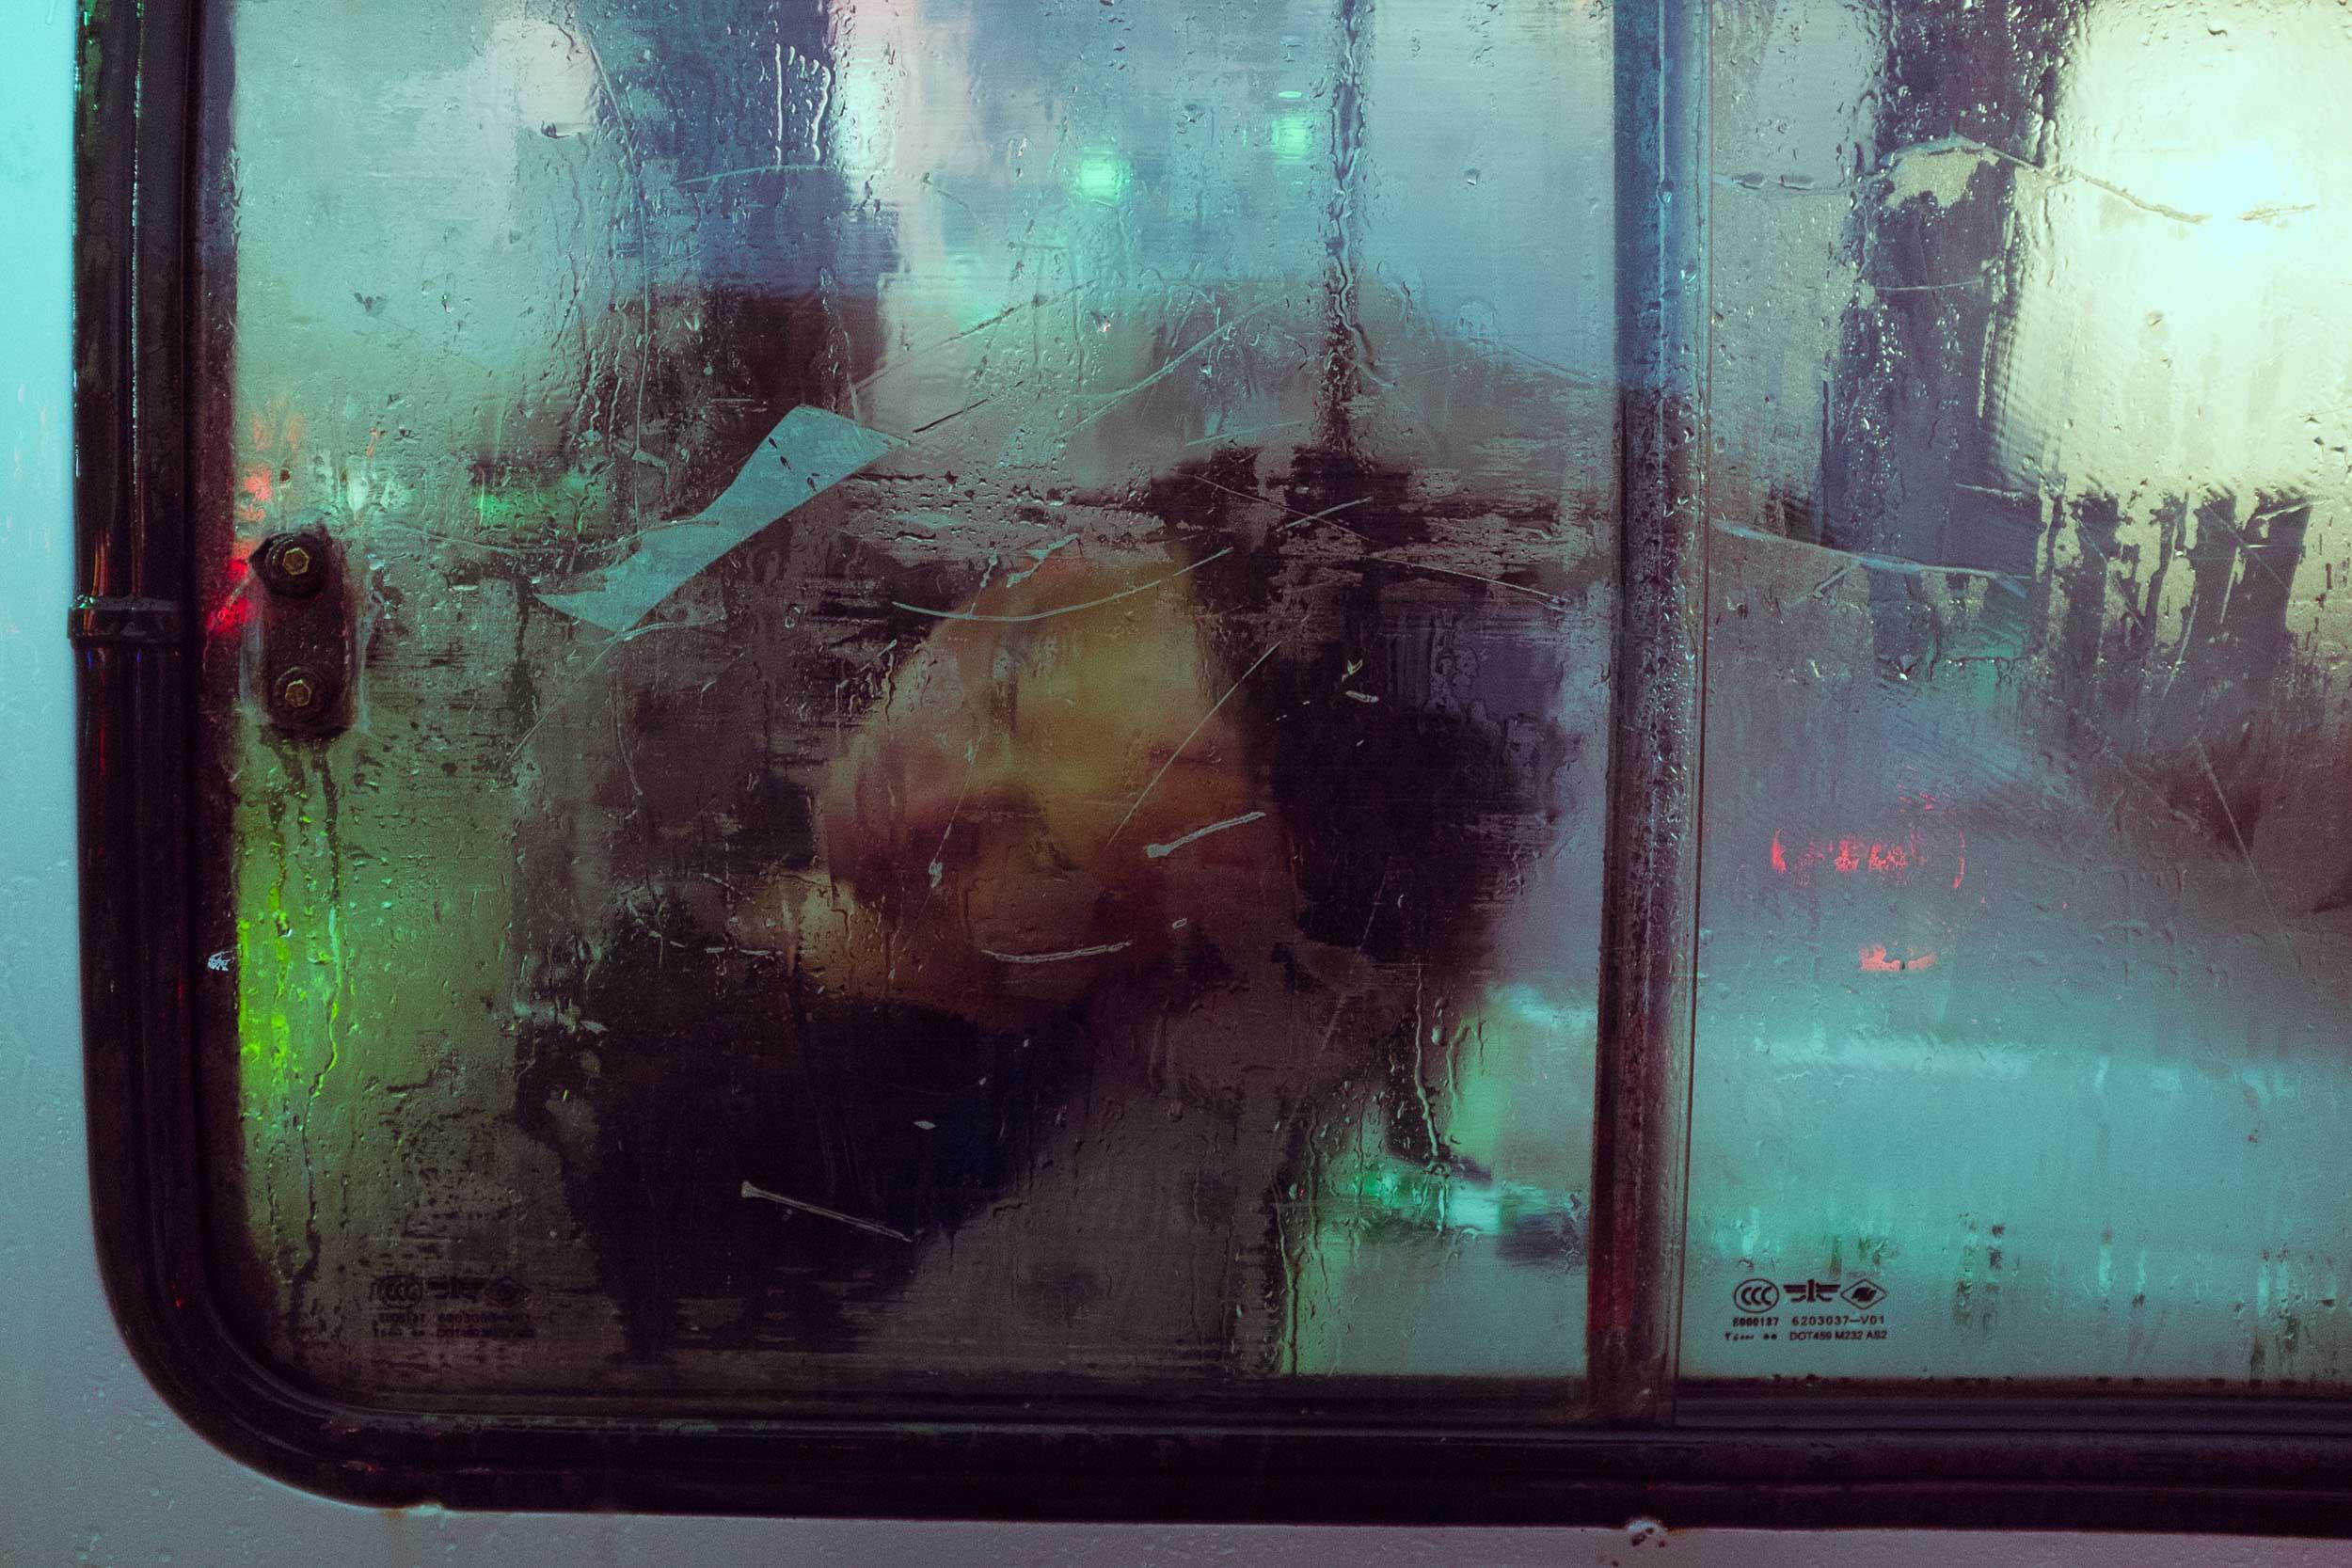 Car Window After Rain